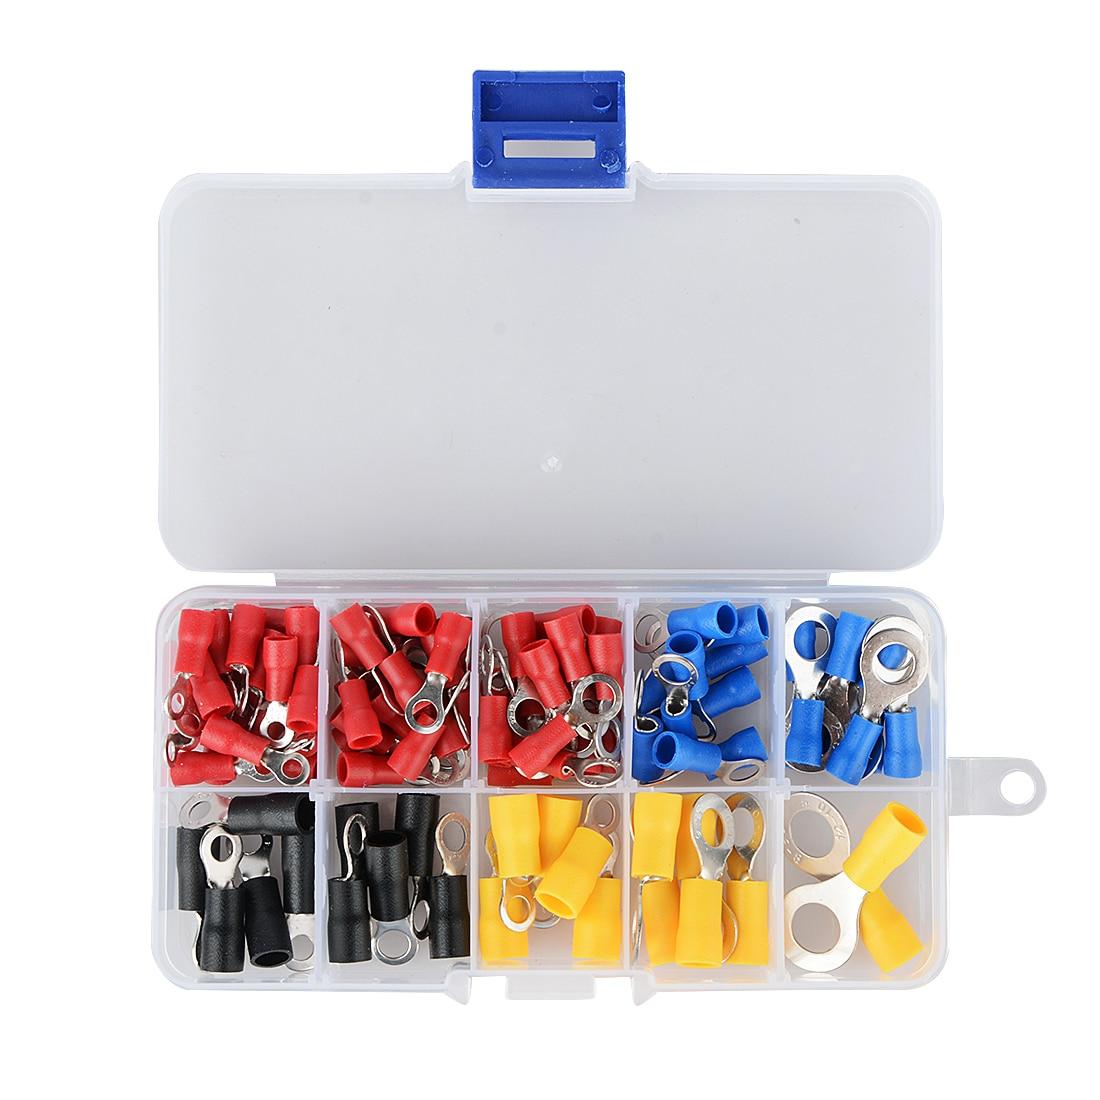 (102 Pcs 10 Arten Rv) Ring Terminal Elektrische Crimp Stecker Kit Set Mit Box, Kupfer Draht Isolierte Cord Pin End Butt Angenehm Im Nachgeschmack